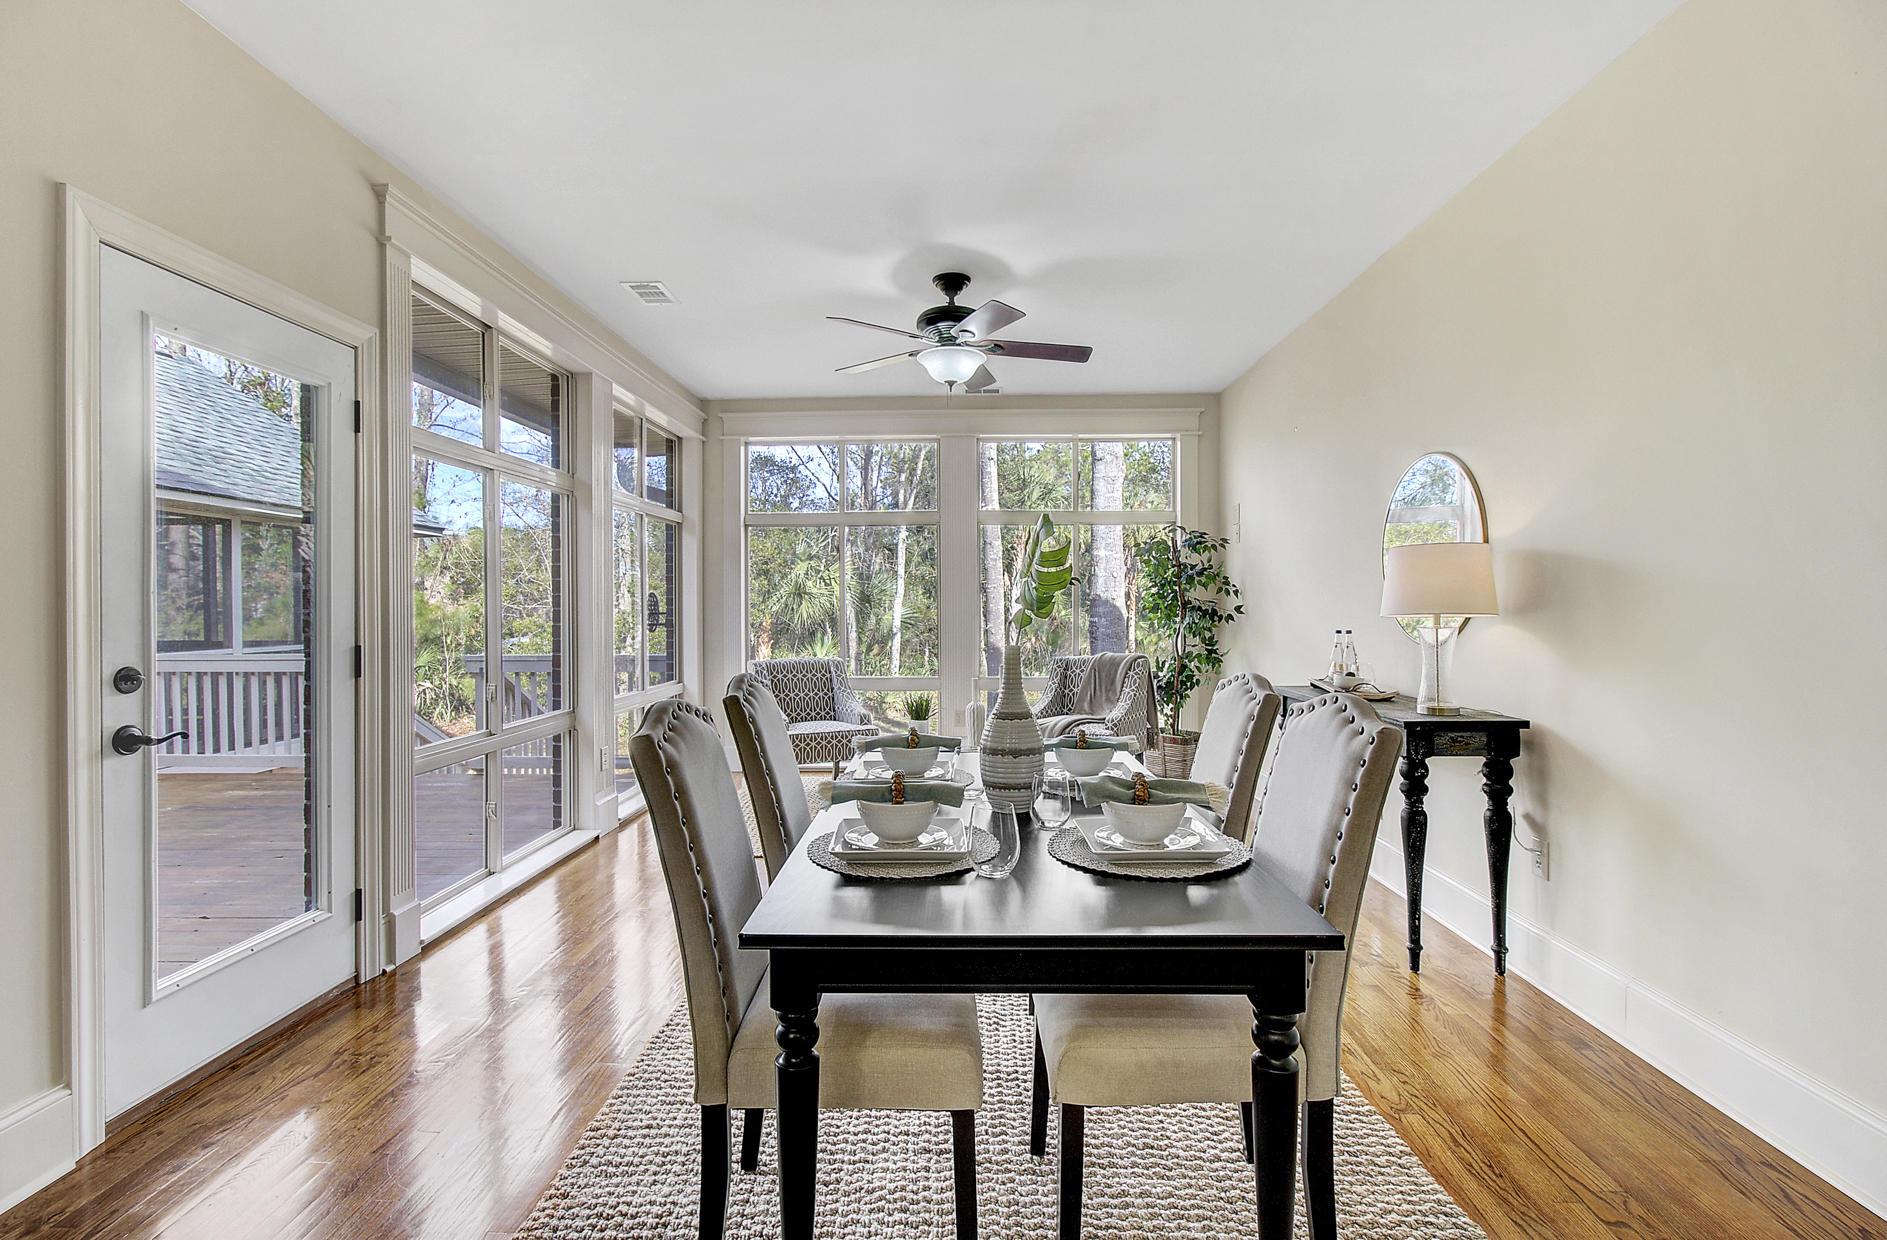 Dunes West Homes For Sale - 4123 Colonel Vanderhorst, Mount Pleasant, SC - 15